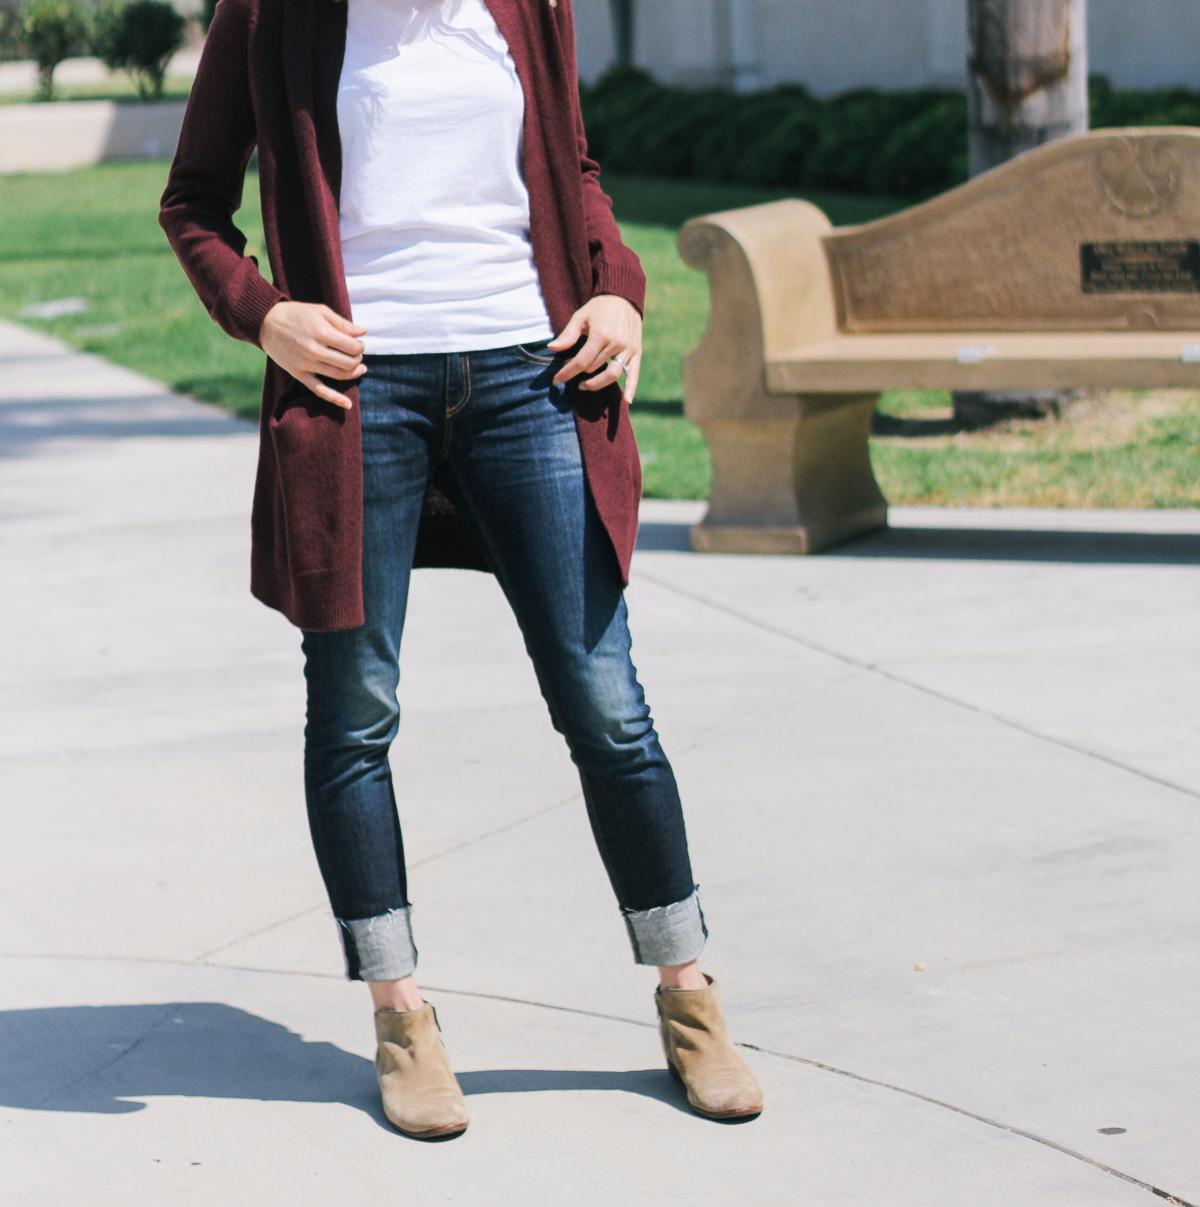 cardigan with pockets, oversized cardigan, long cardigan, nordstrom cardigan, burgundy cardigan, rag and bone jeans, dark denim, cuffed denim, boyfriend jeans, sam edelman booties, grey suede booties, fall cardigan